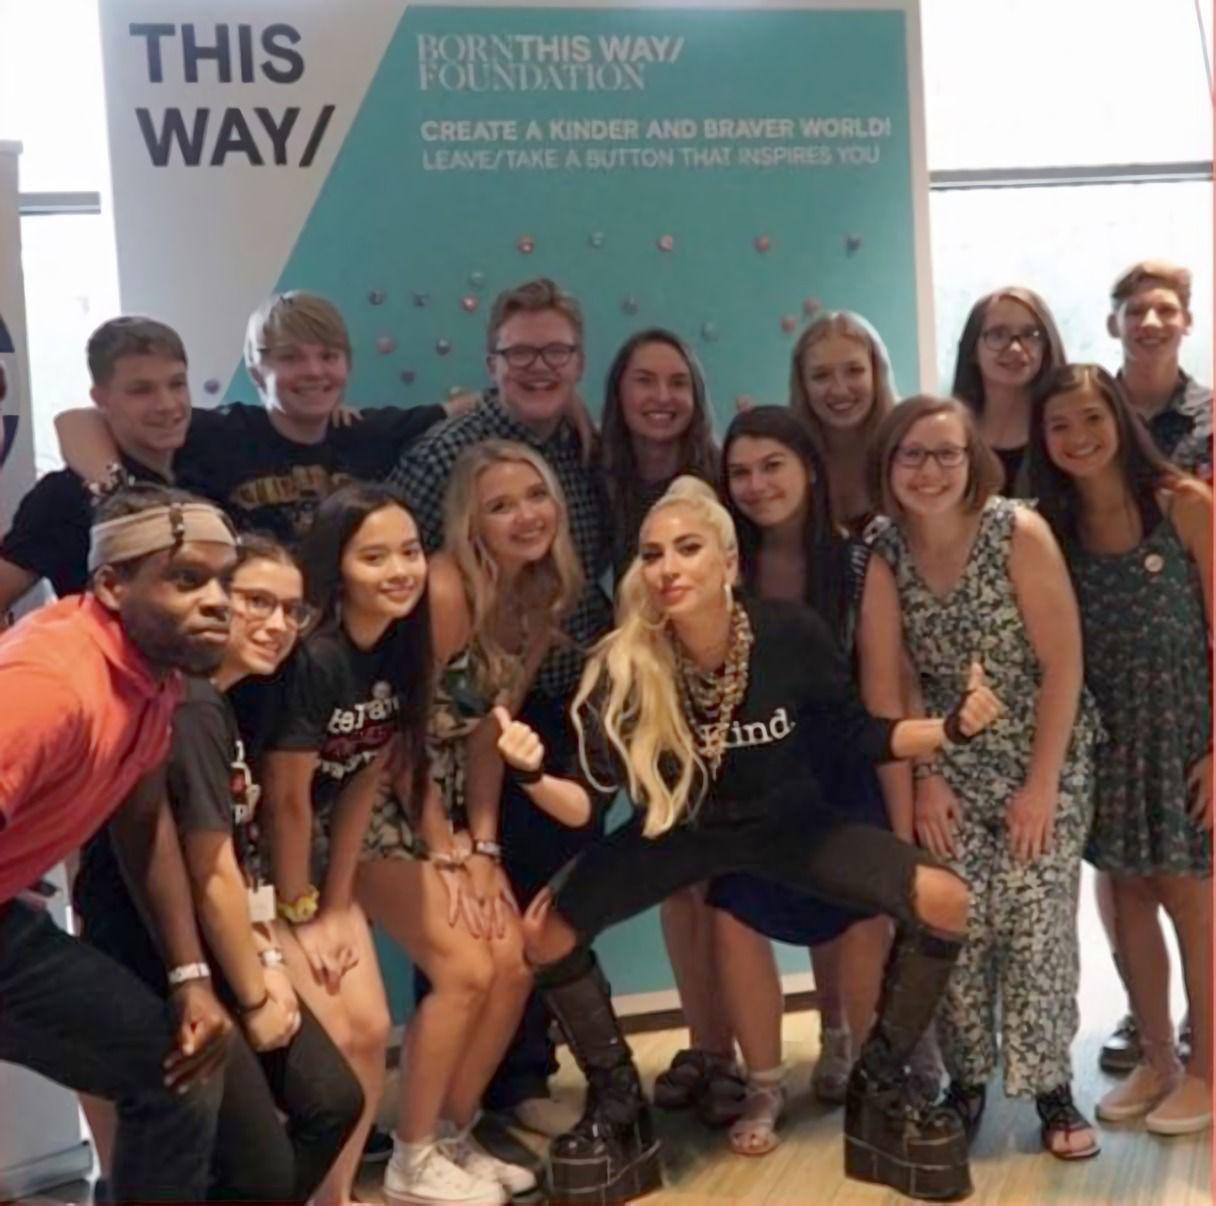 Teens meet Lady Gaga, talk about mental health challenges